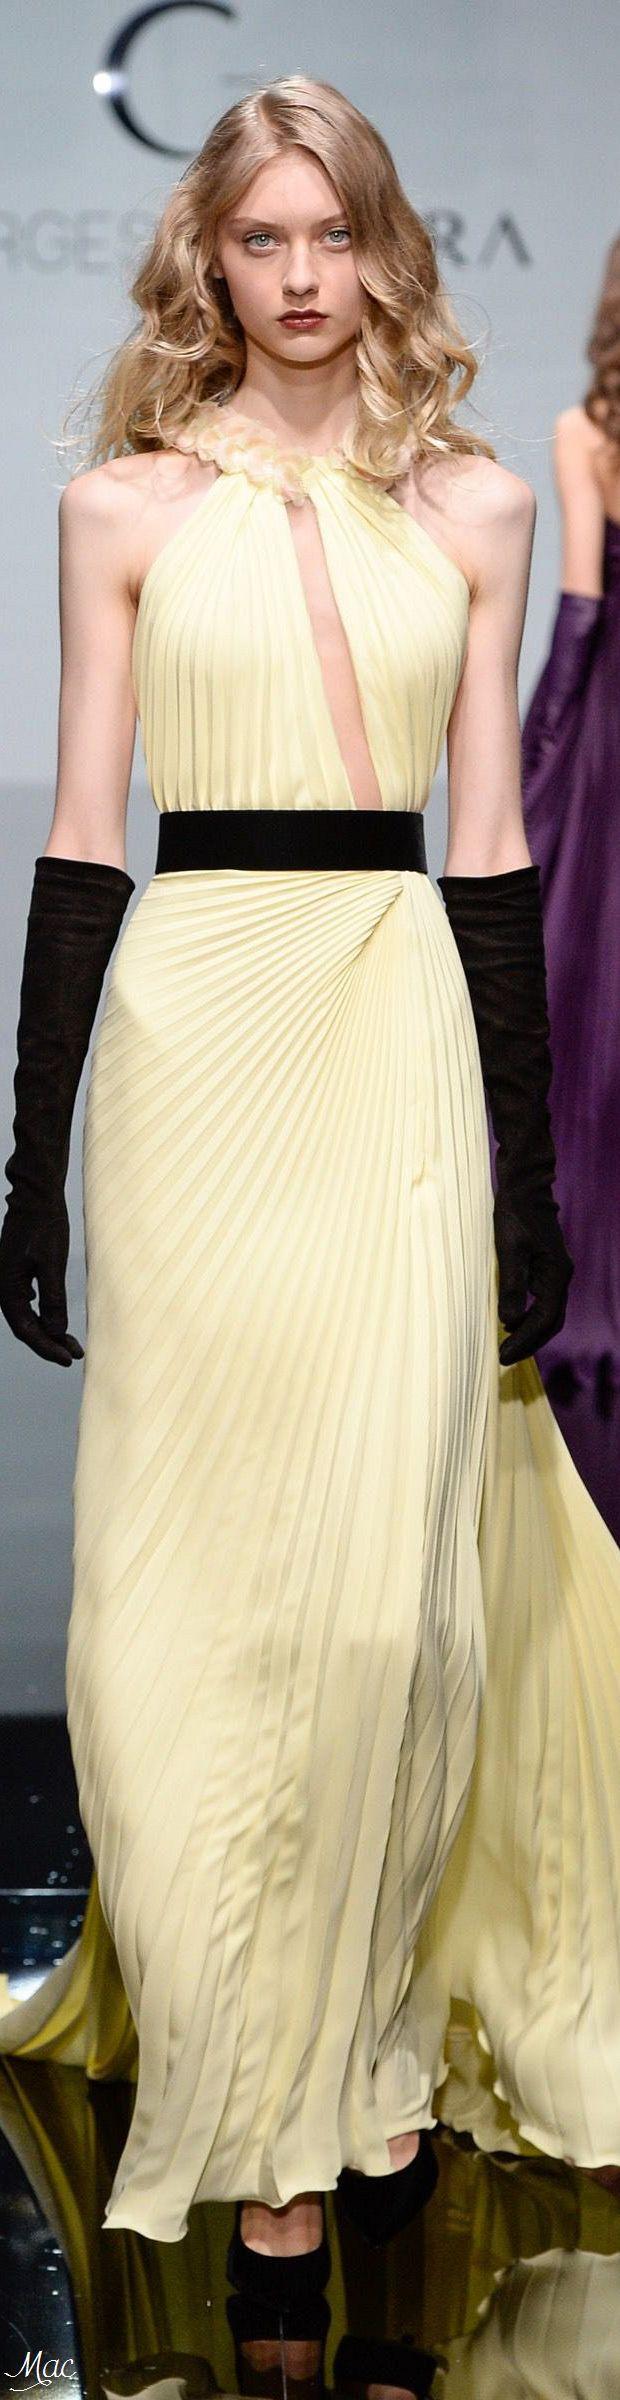 best a nice dress images on pinterest